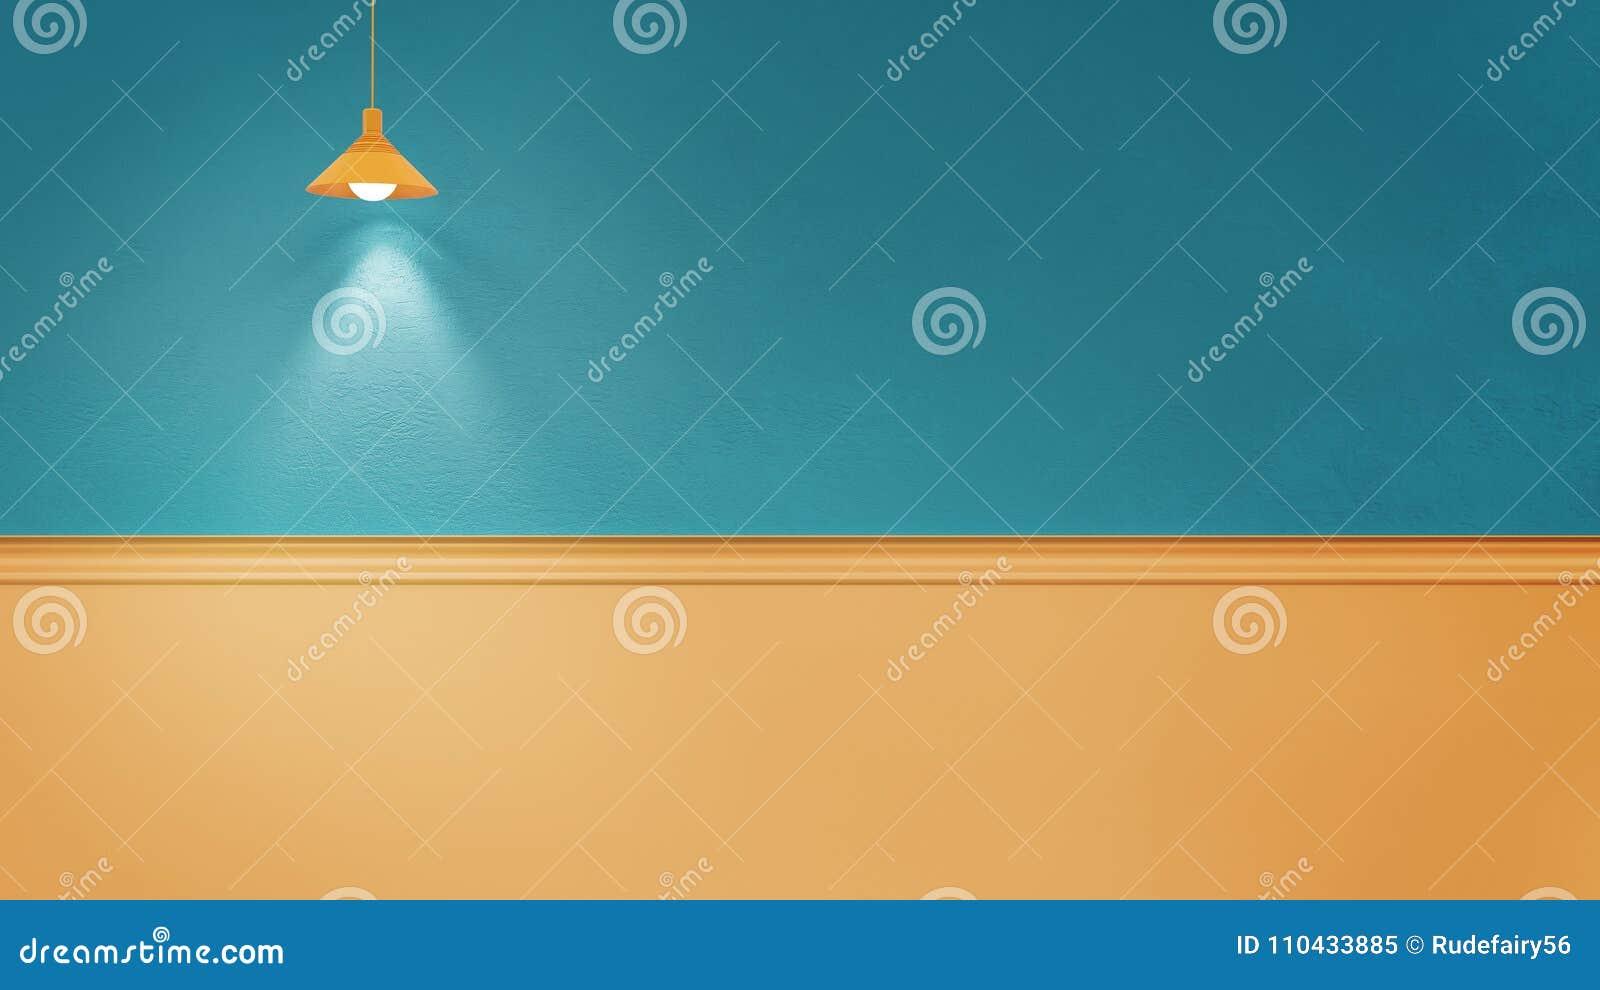 3d Rendering Illustration Of Blue Yellow Room Stock Illustration ...